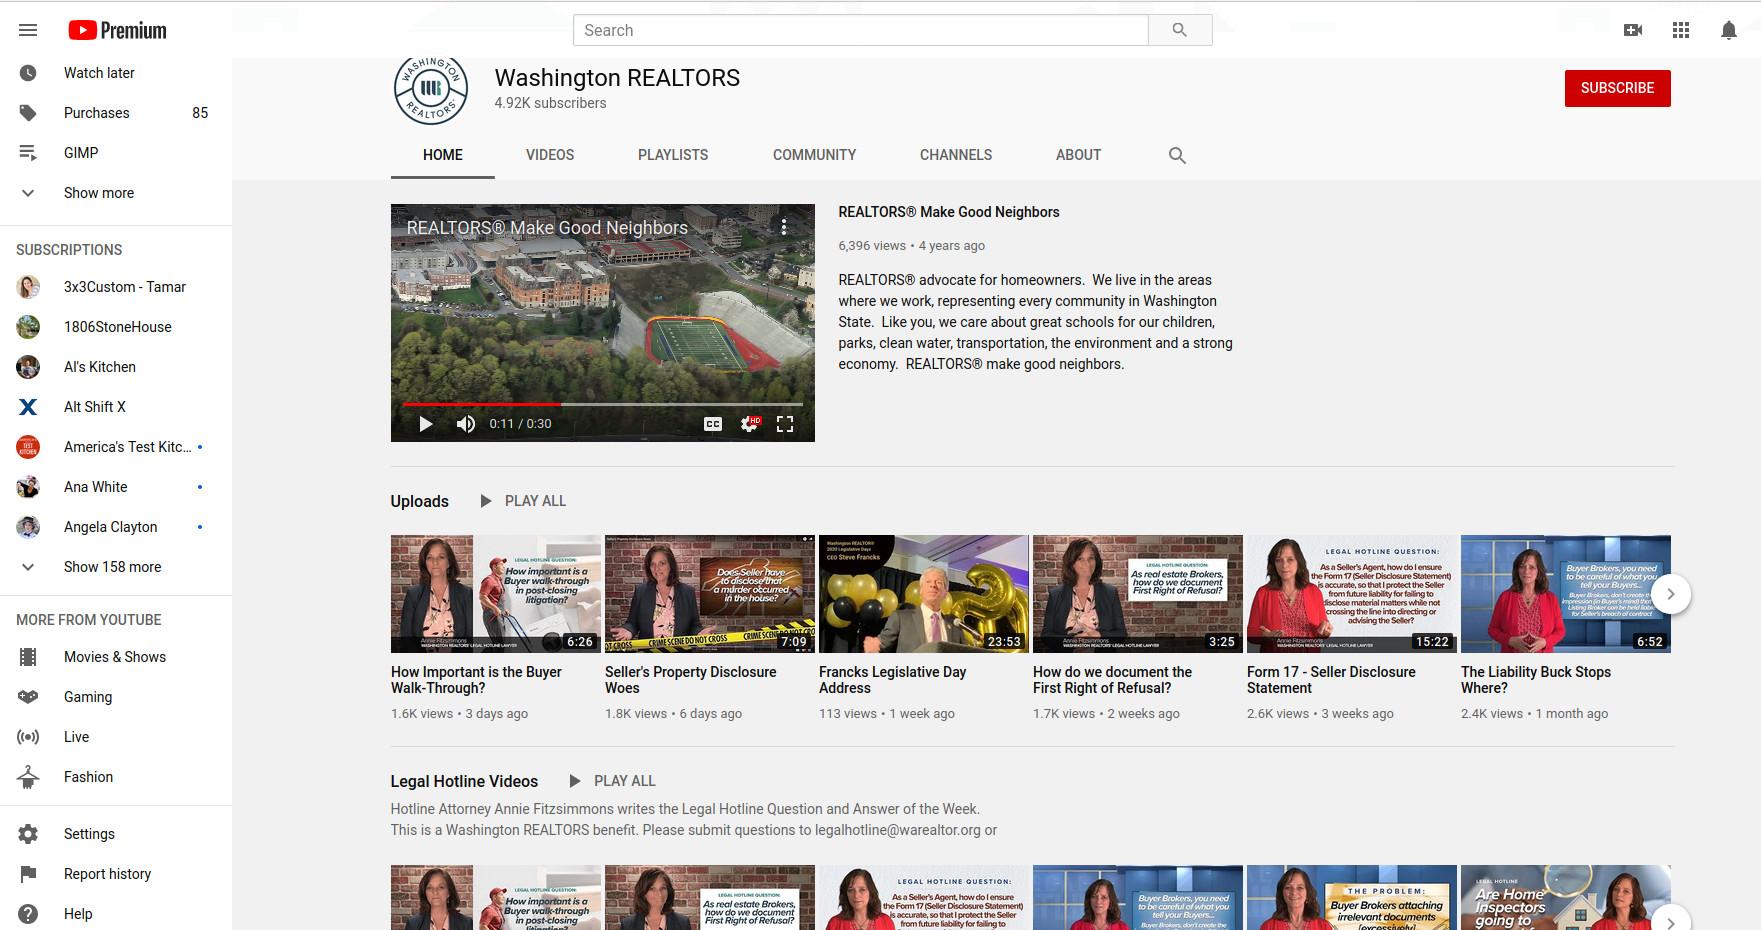 WA Realtors' Legal Hotline YouTube Channel